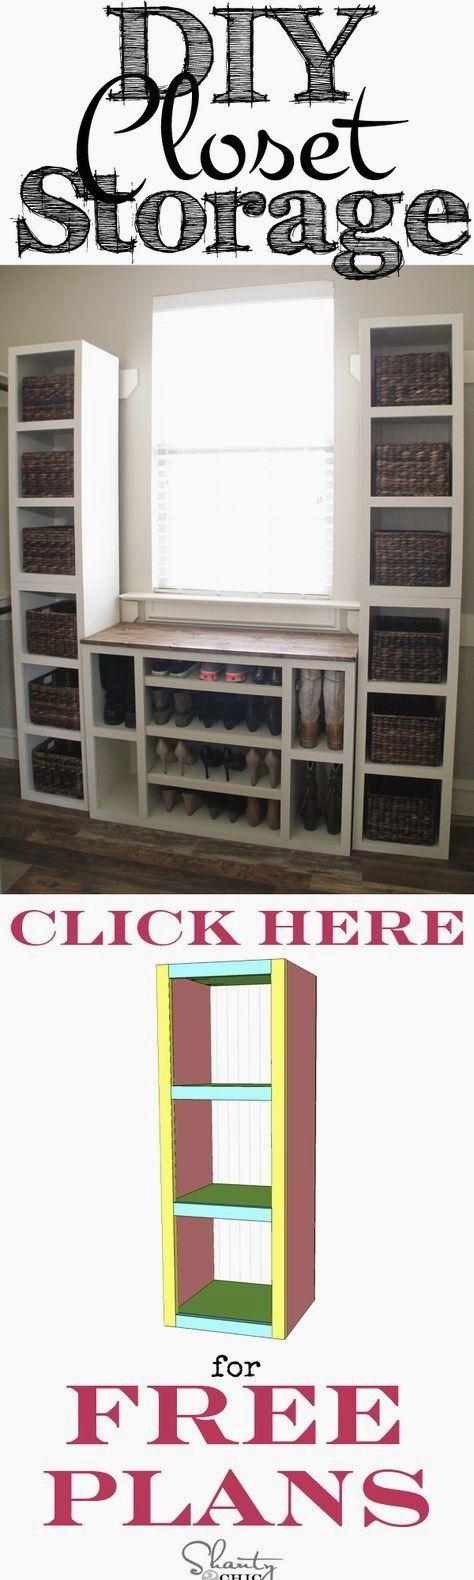 cheap bedroom decor ideas  check pin for many diy bedroom